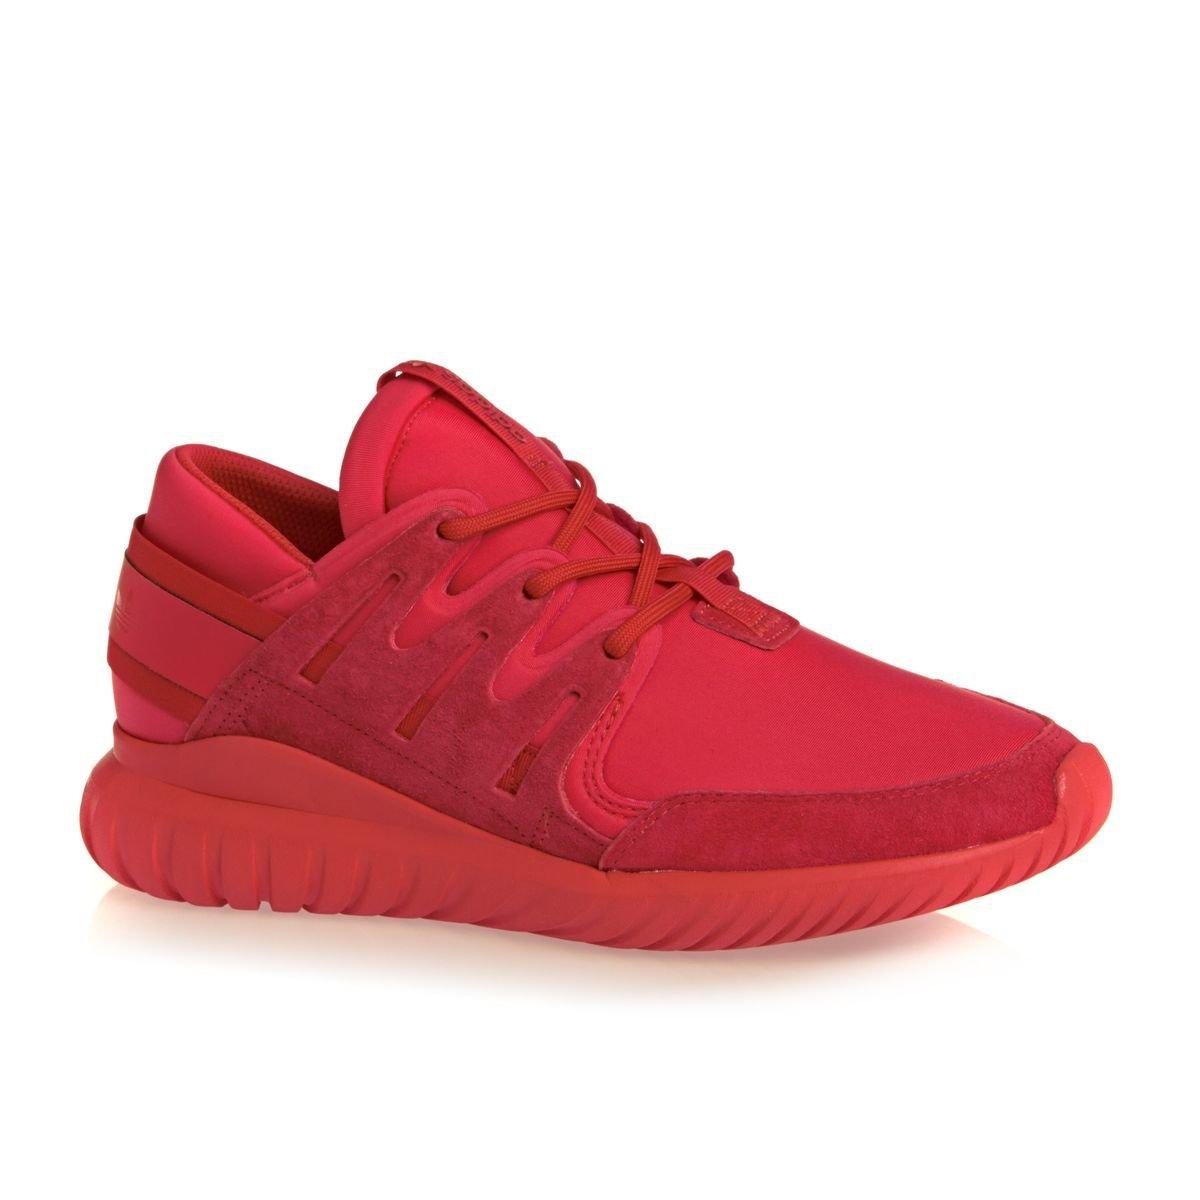 free shipping 0f369 4671b adidas Originals Tubular Nova S74819 Sneaker Schuhe Shoes